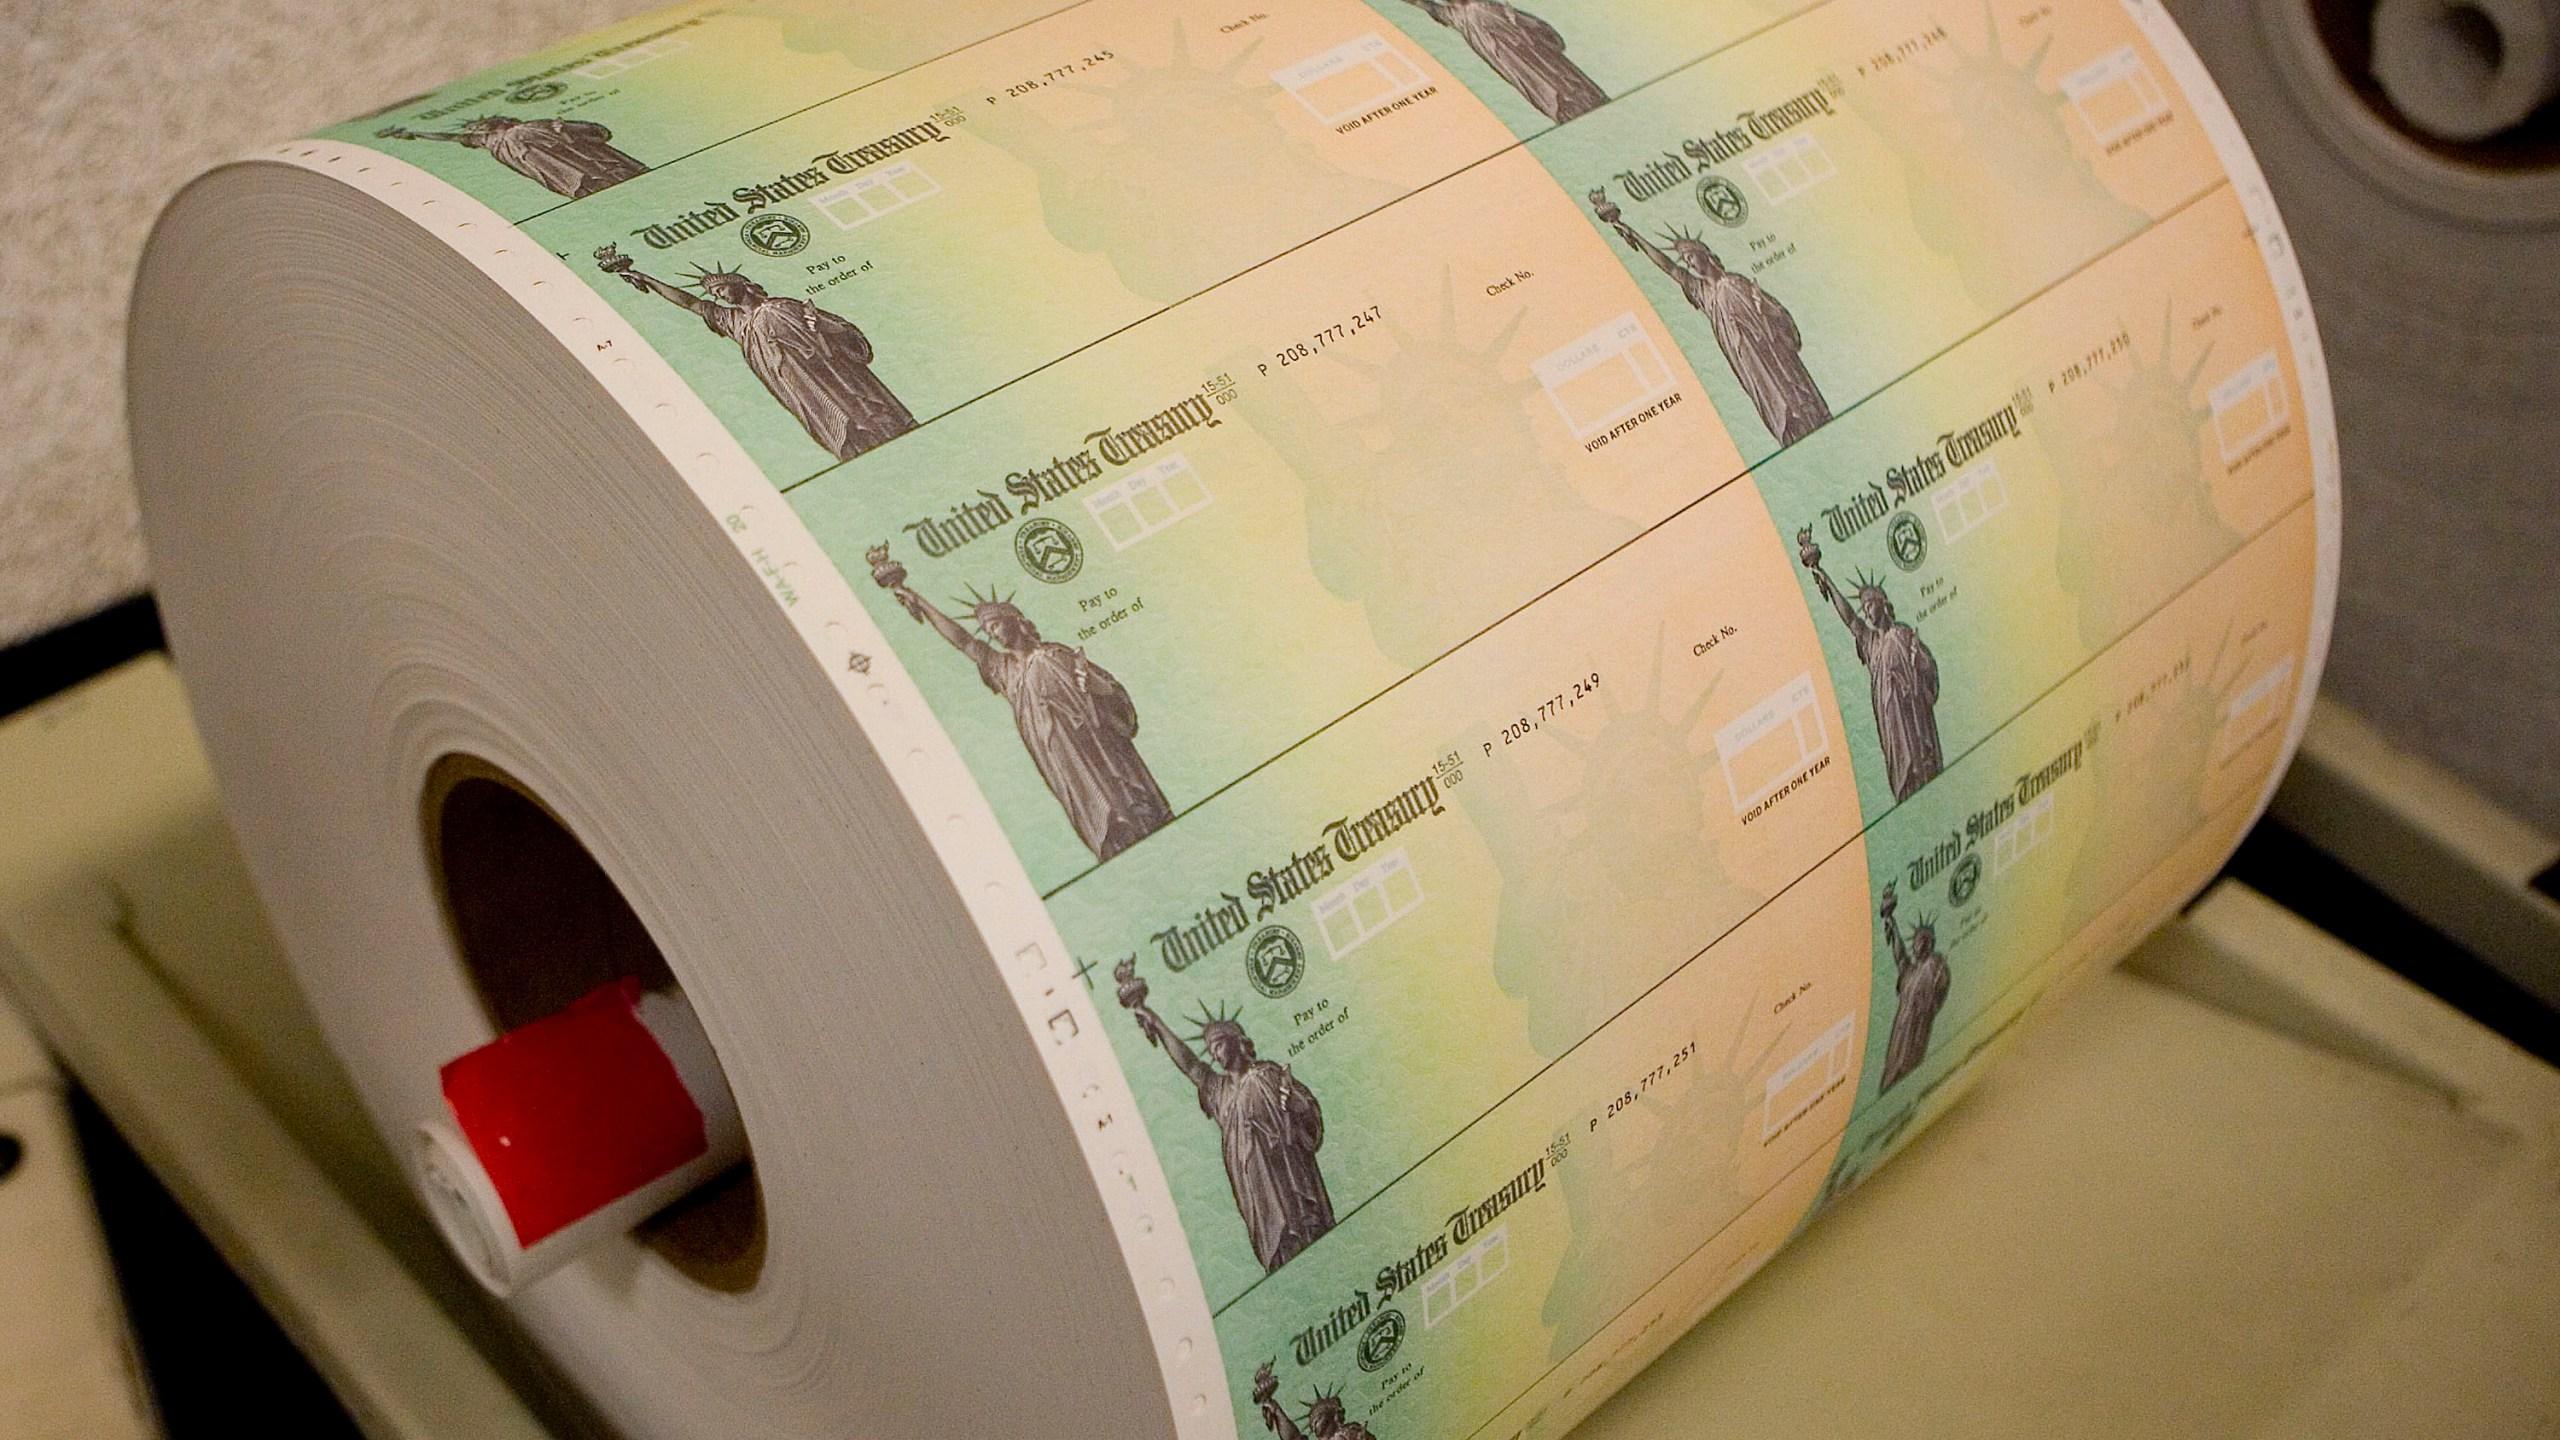 Economic stimulus checks are prepared for printing at the Philadelphia Financial Center May 8, 2008 in Philadelphia, Pennsylvania. (Jeff Fusco/Getty Images)